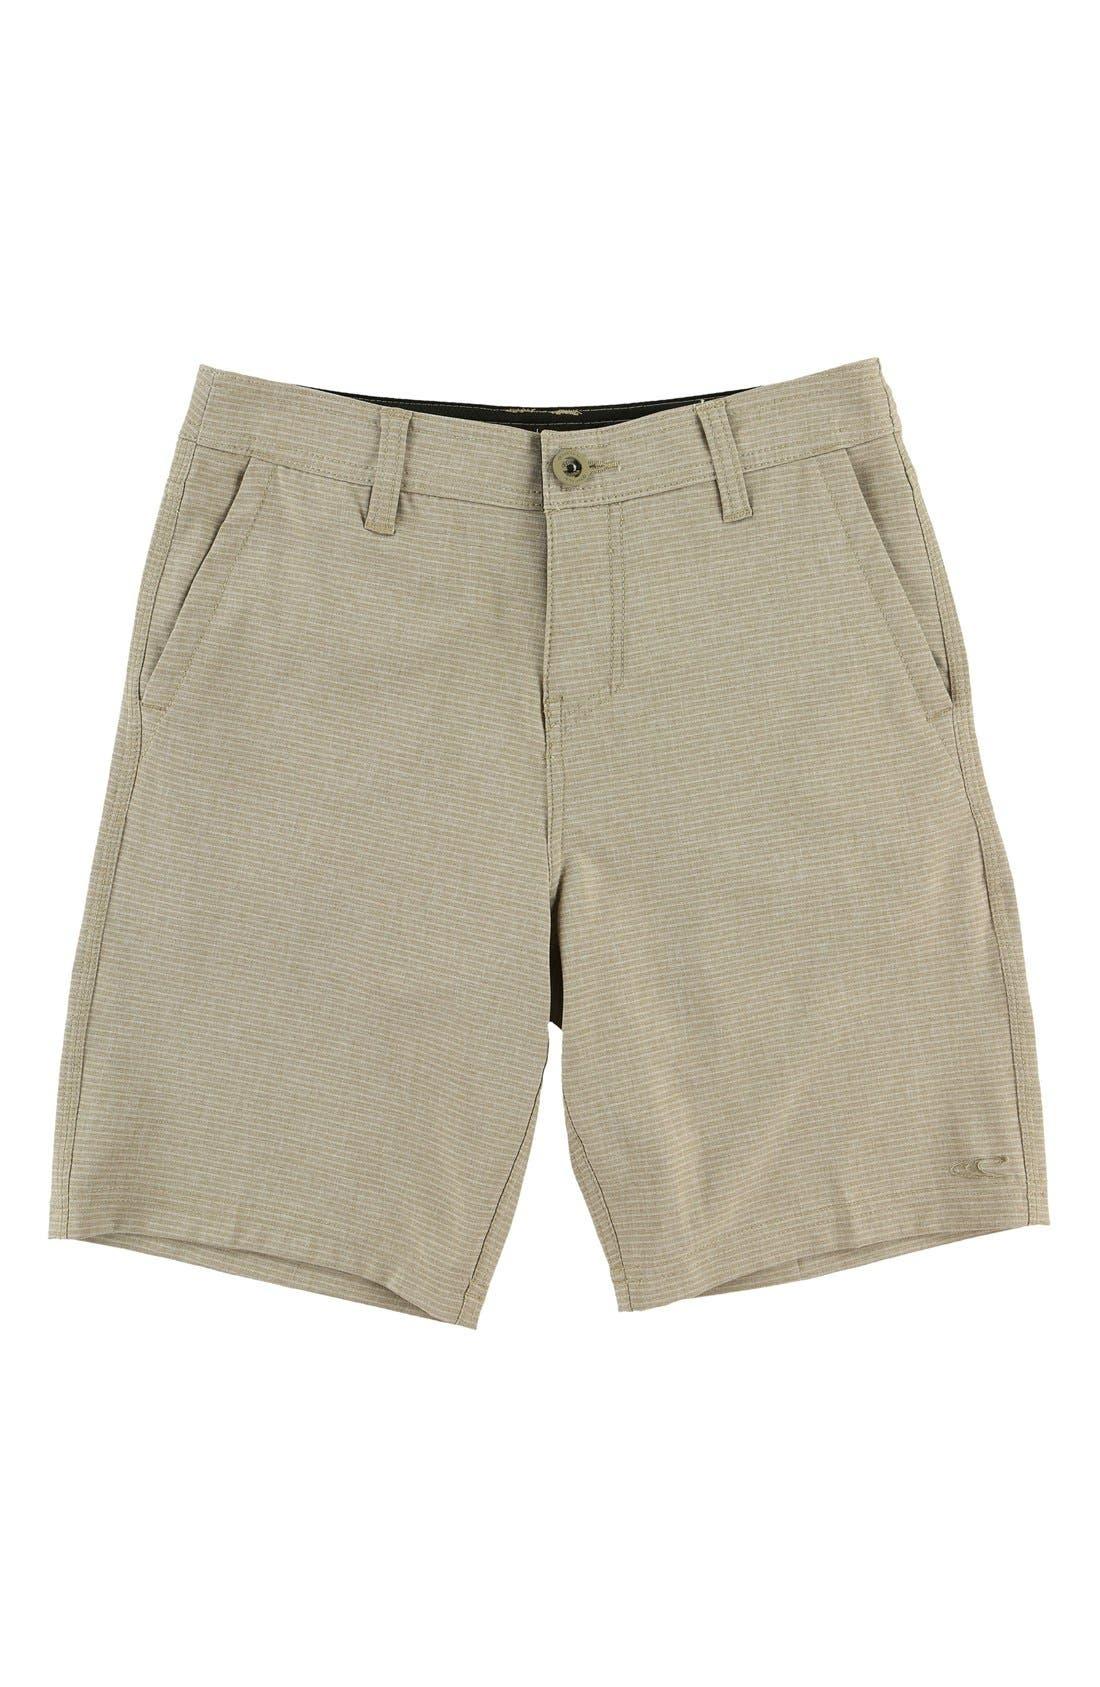 Locked Stripe Hybrid Board Shorts,                         Main,                         color, Khaki